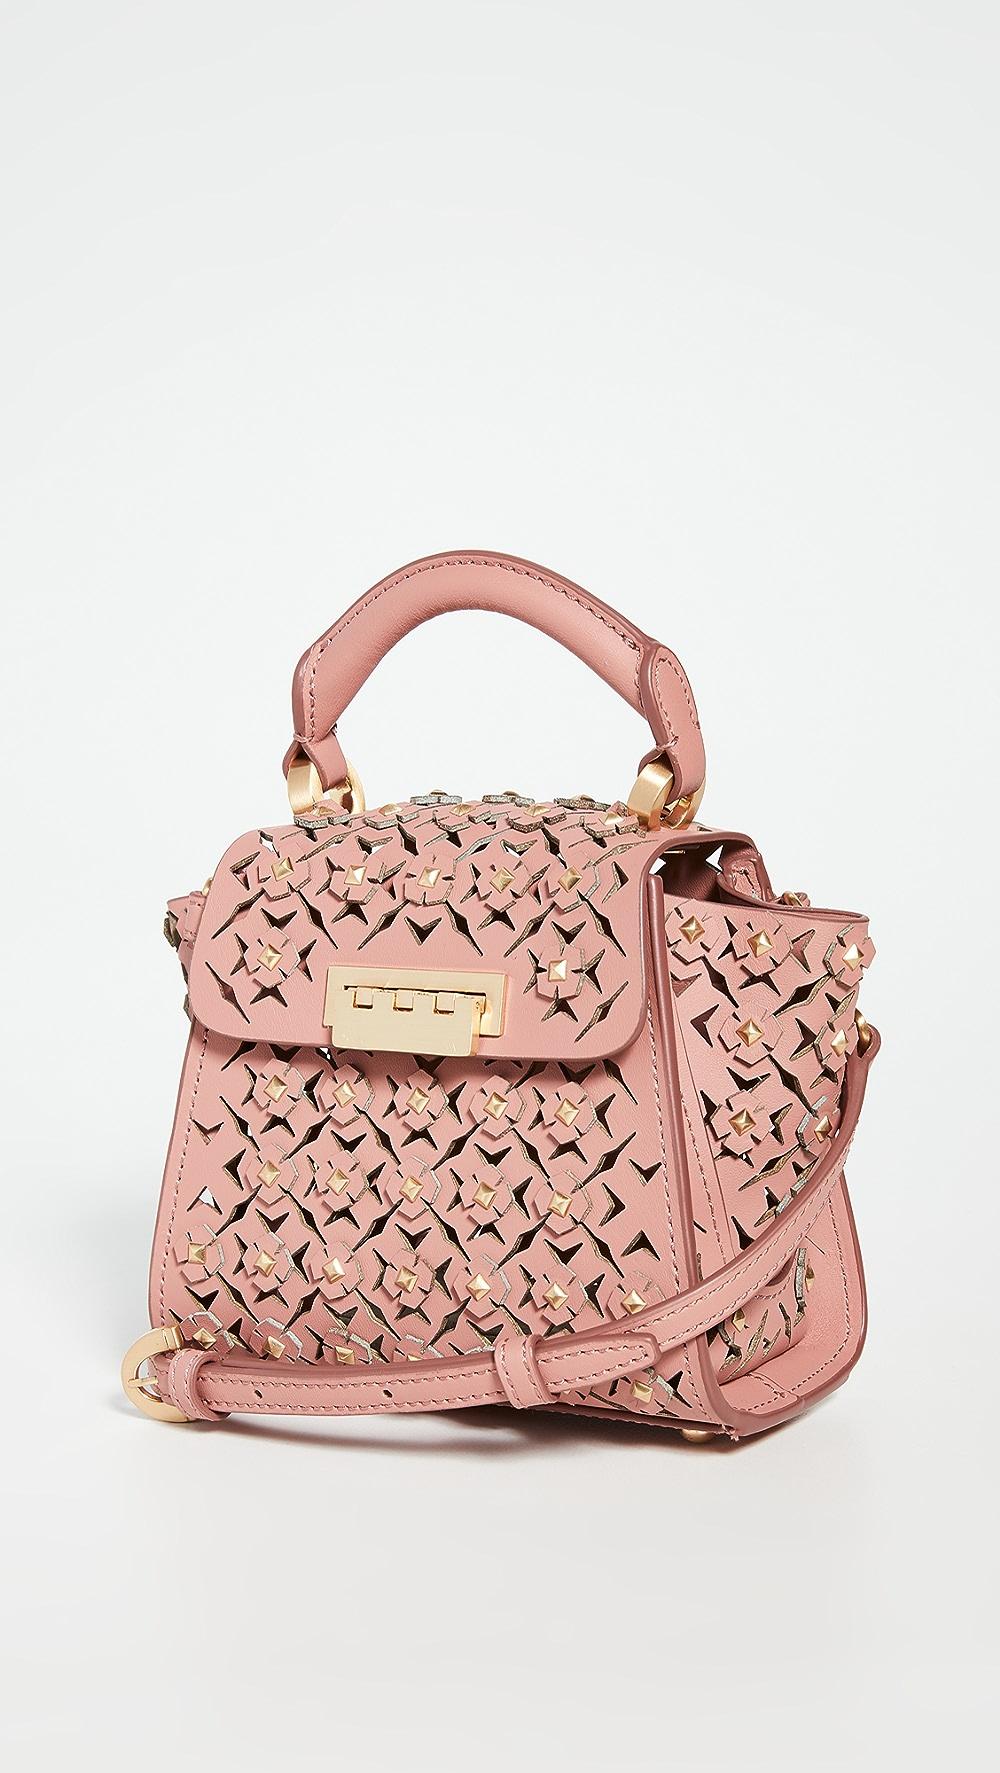 2019 Latest Design Zac Zac Posen - Eartha Mini Top Handle Bag Good Taste